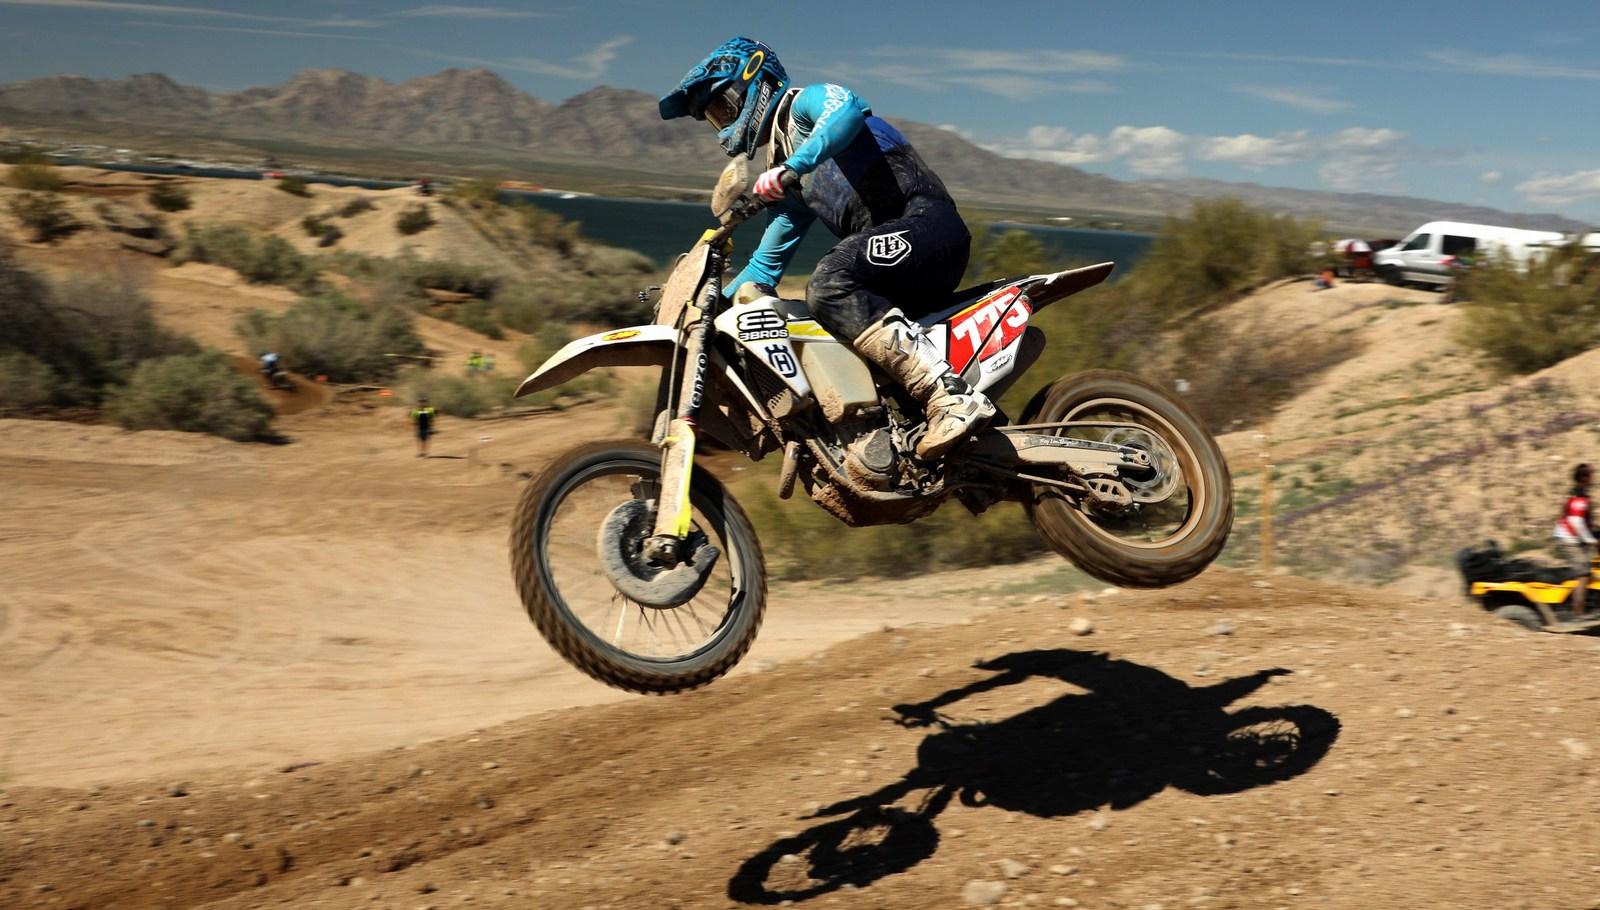 2019-03-austin-walton-jump-bike-worcs-racing